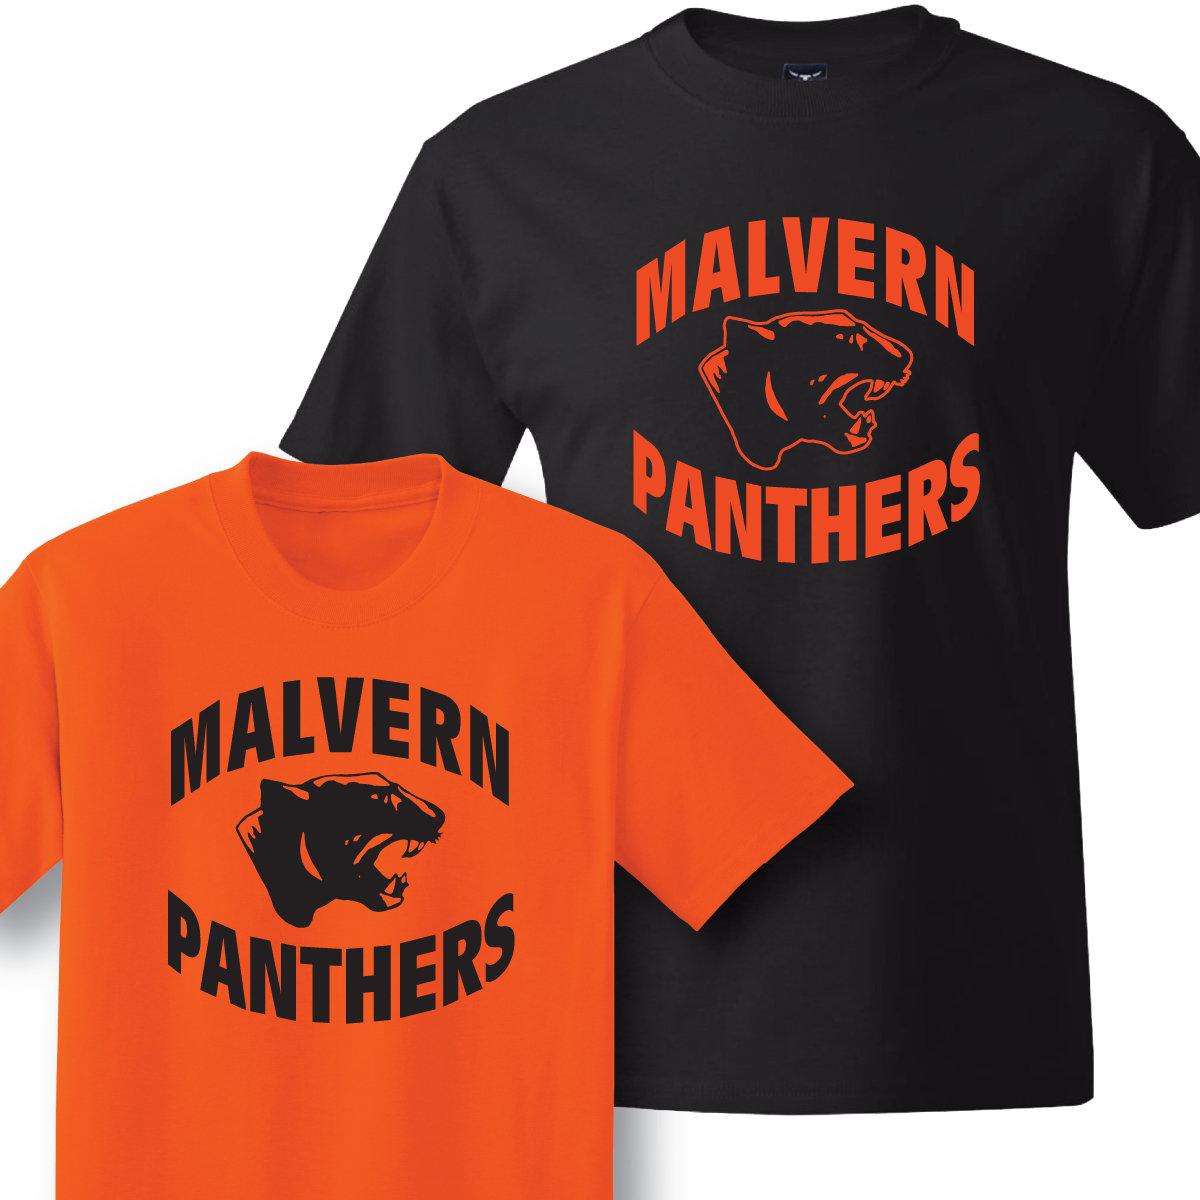 Retro Malvern Panther Apparel